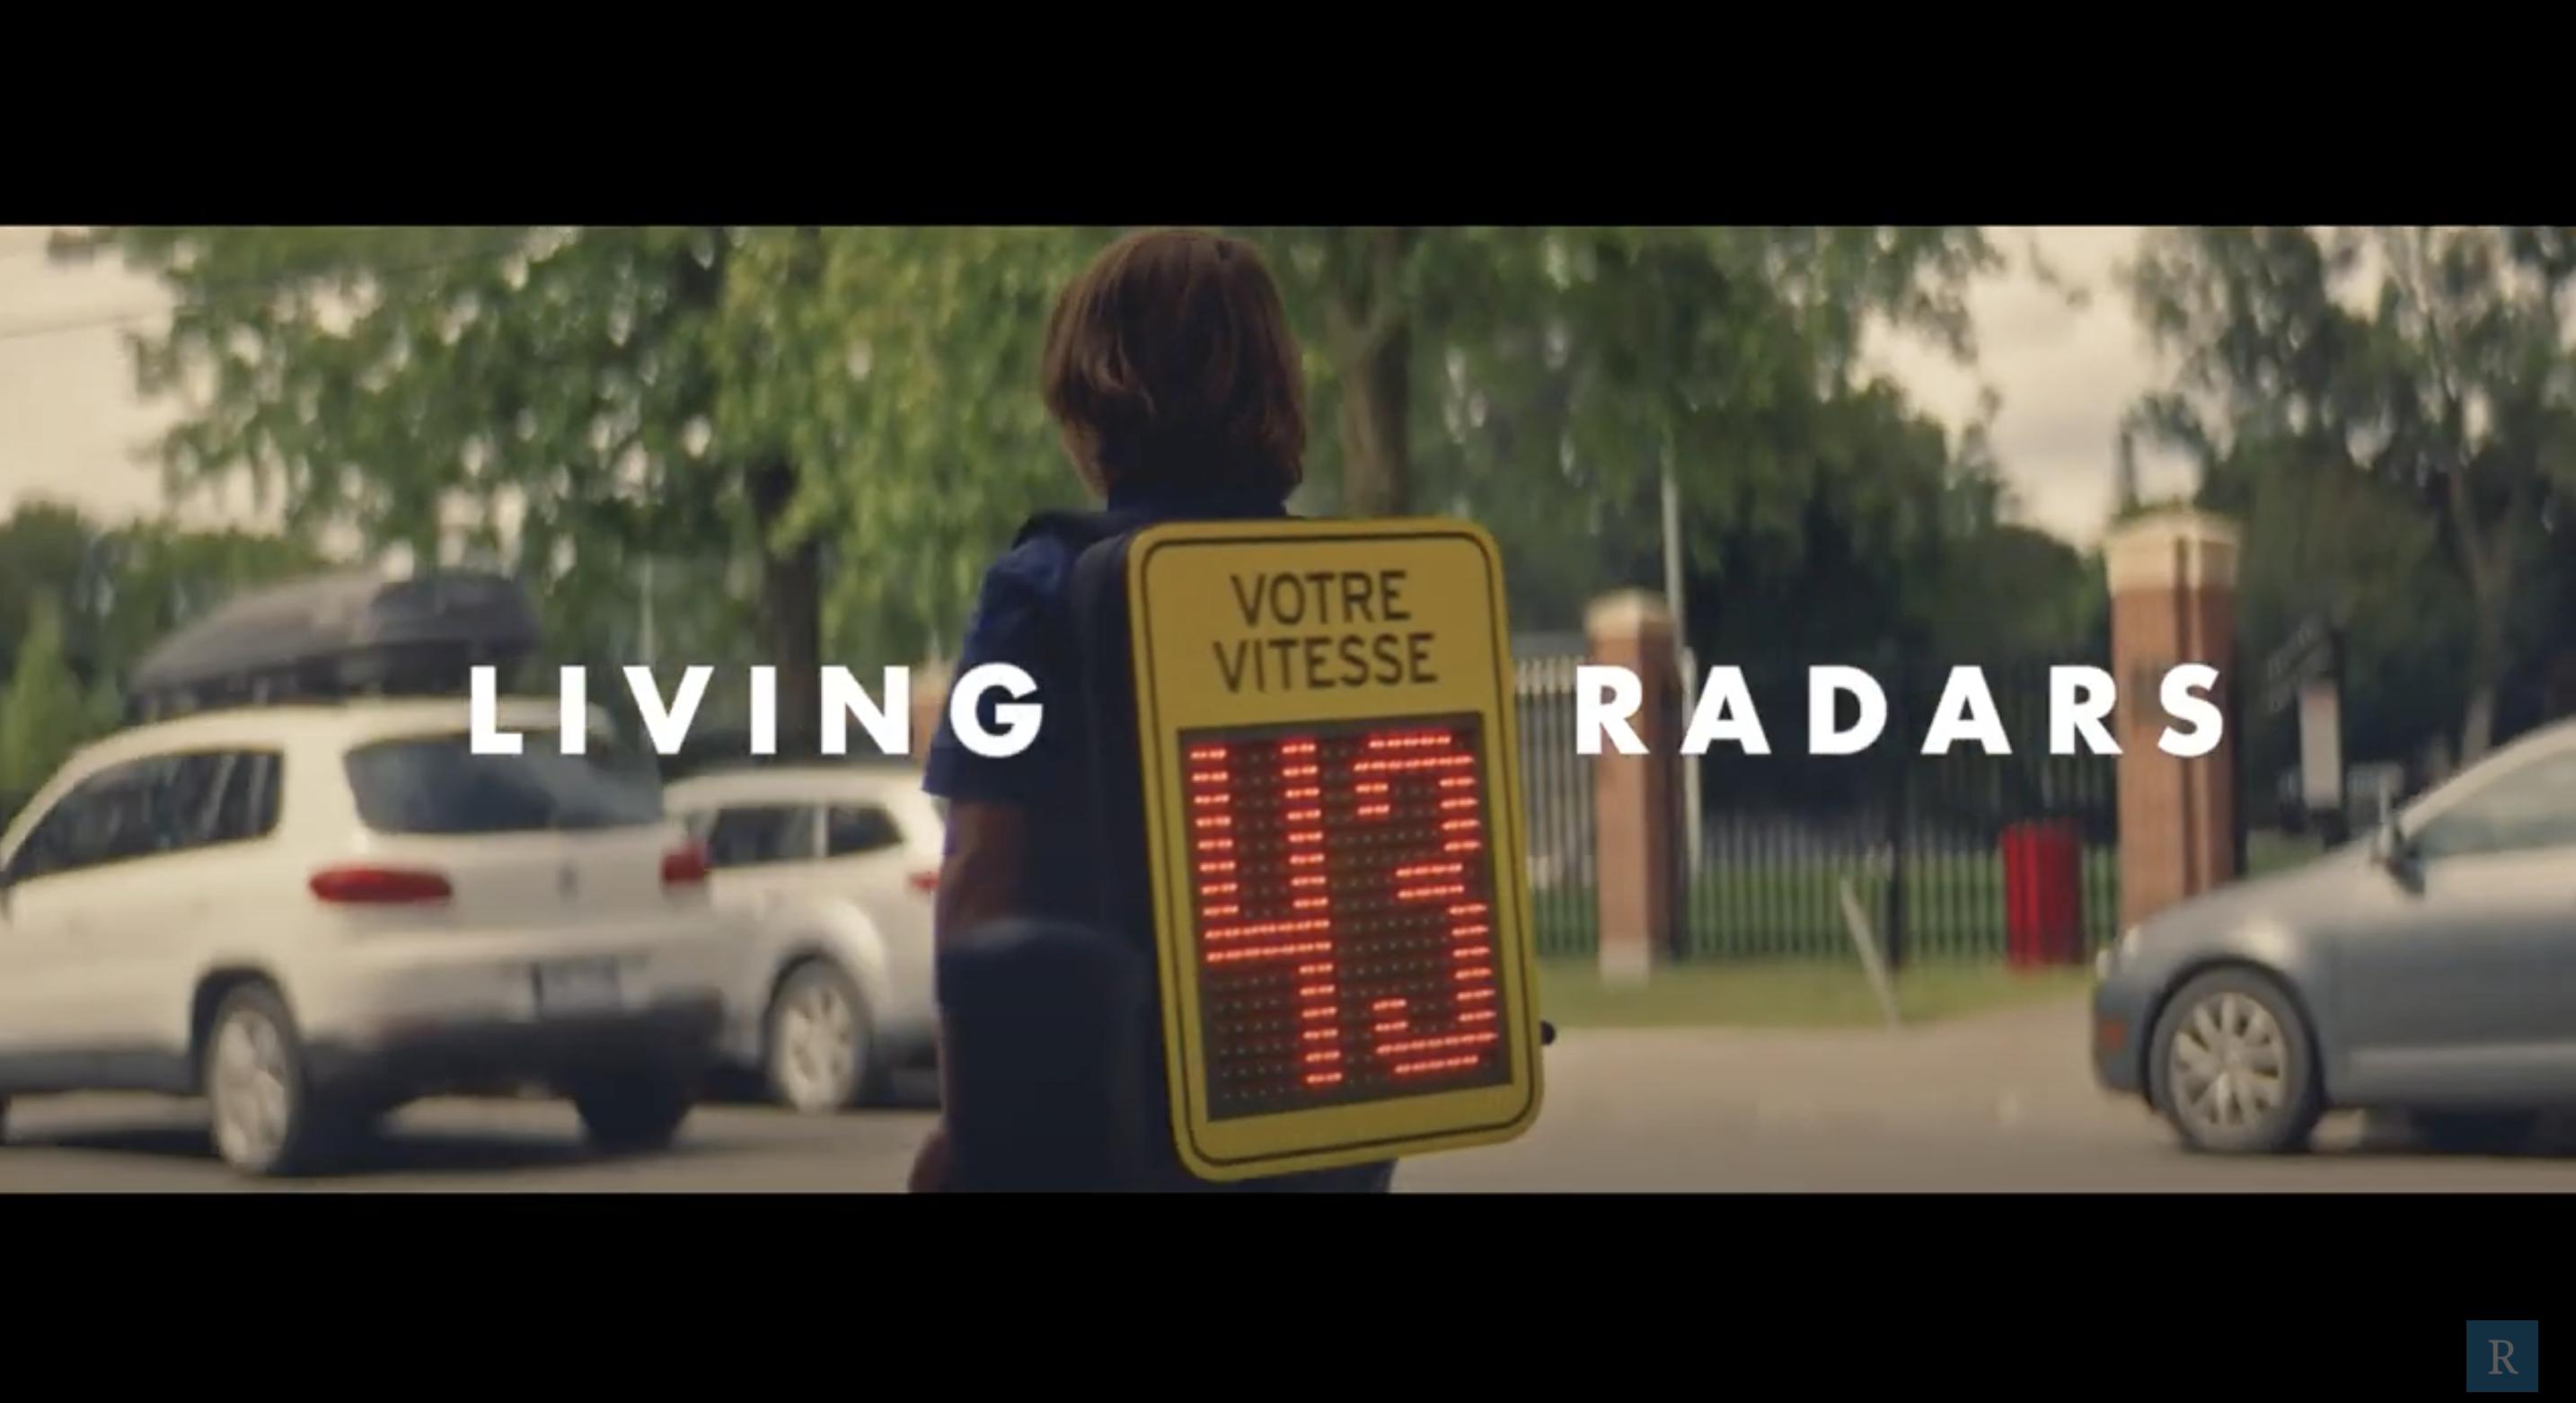 Living Radars: เรดาร์มีชีวิต ตรวจจับความเร็วในเขตโรงเรียน ทำงานด้วยชีวิตของเด็กนักเรียน